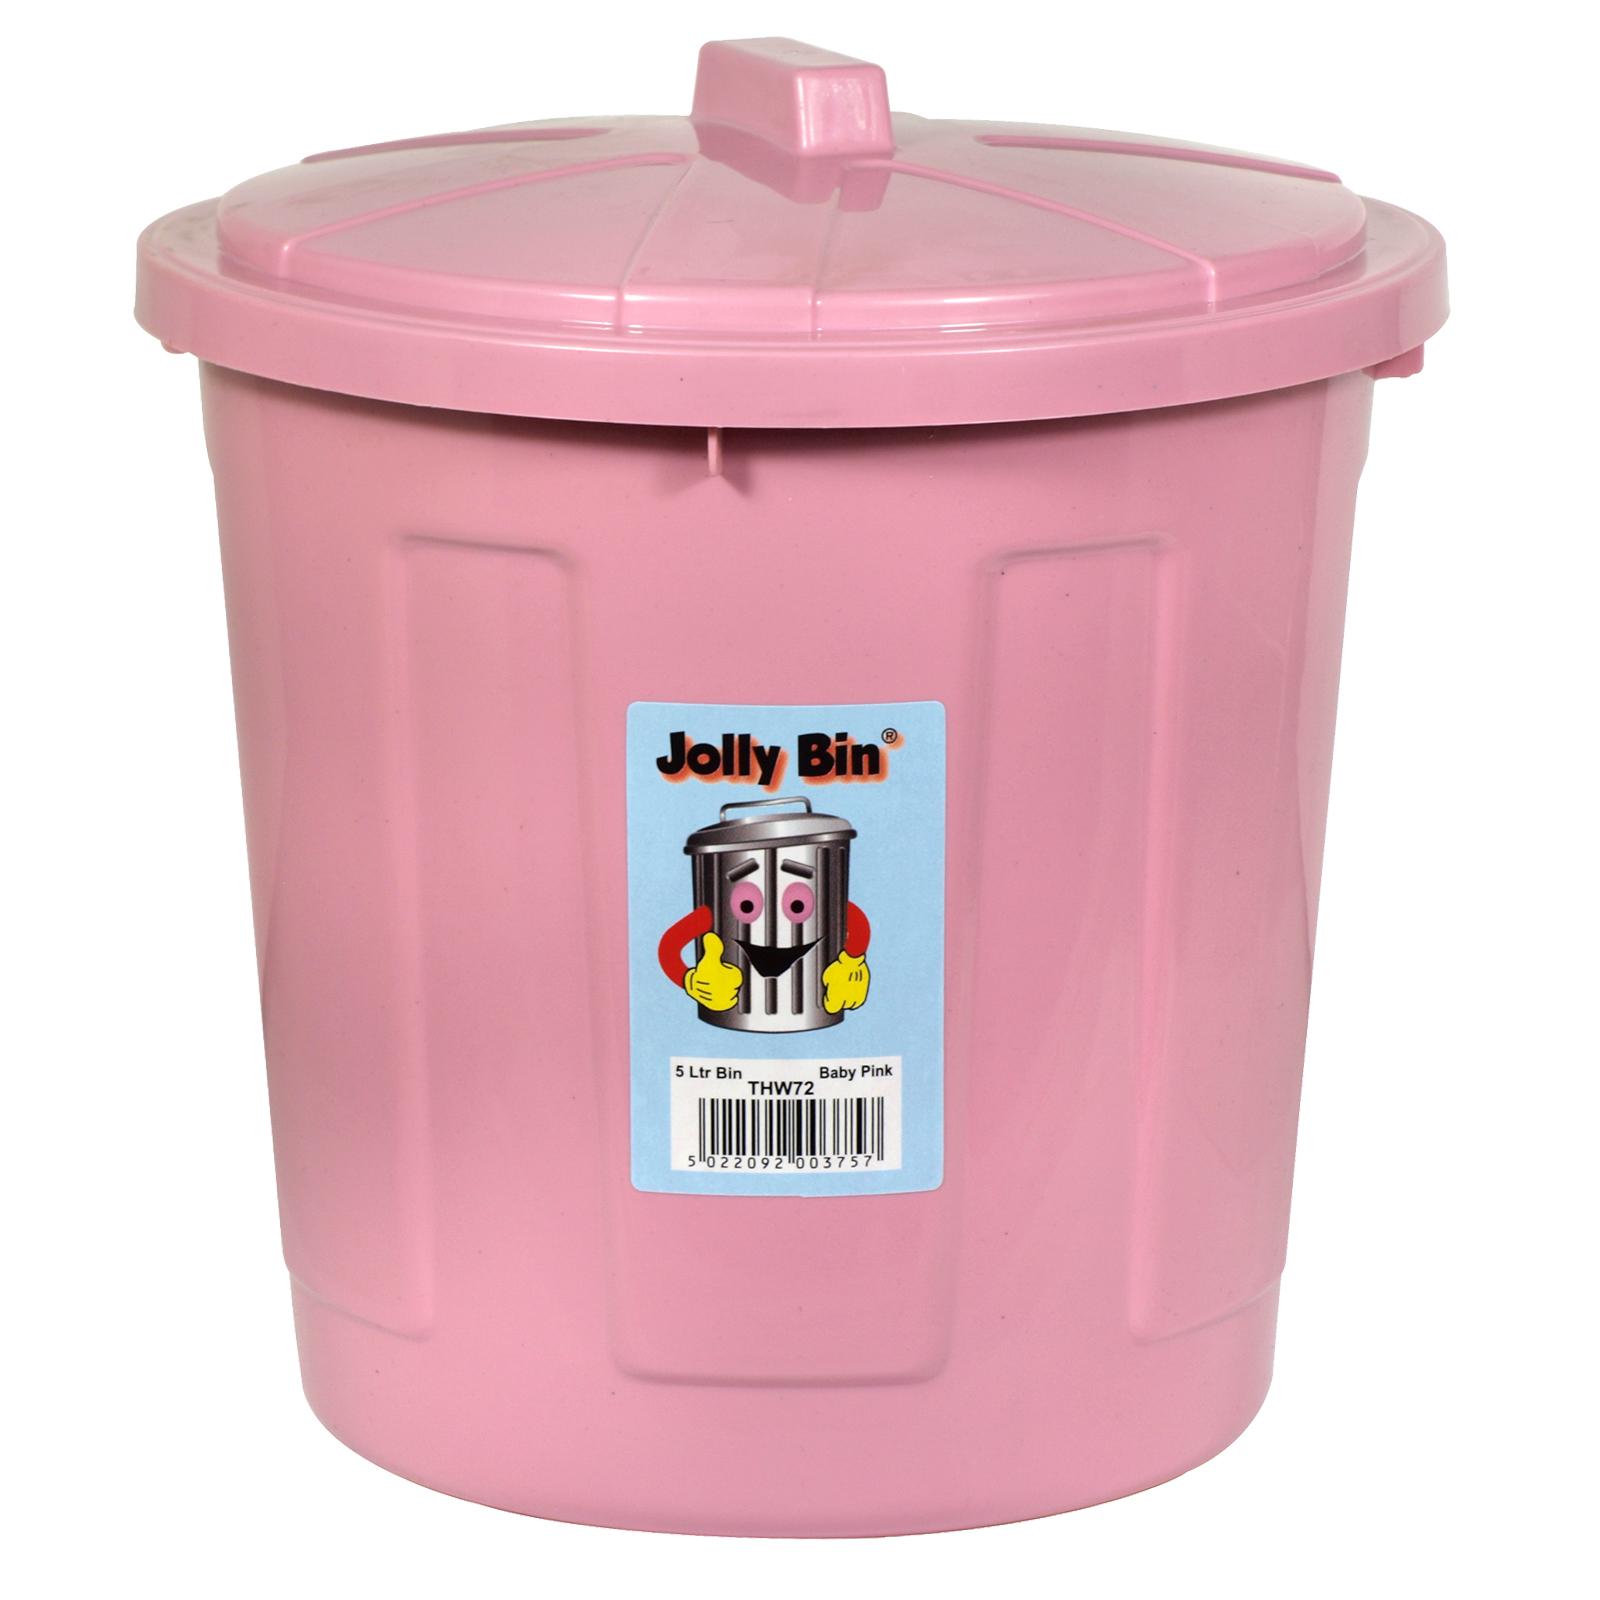 JOLLY BIN 5L BABY PINK